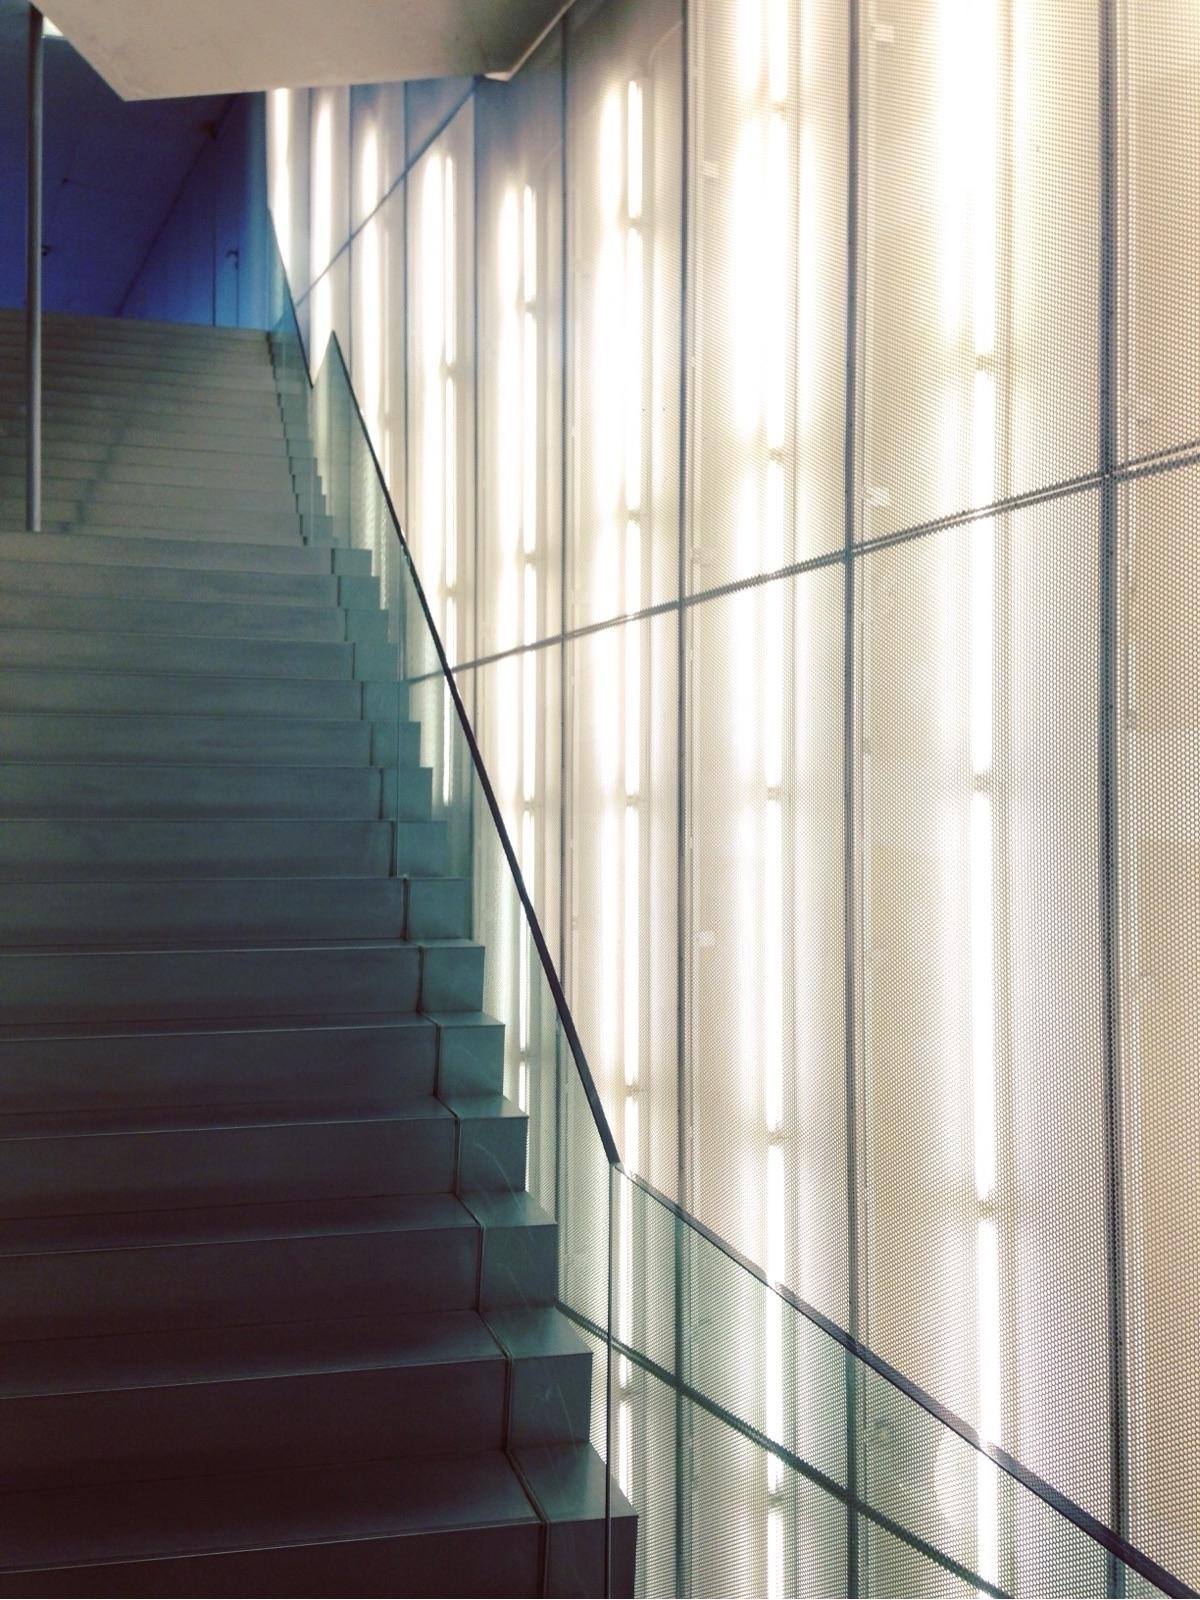 LightWall. OPO, Portugal, Casa  - pmbmendonca | ello